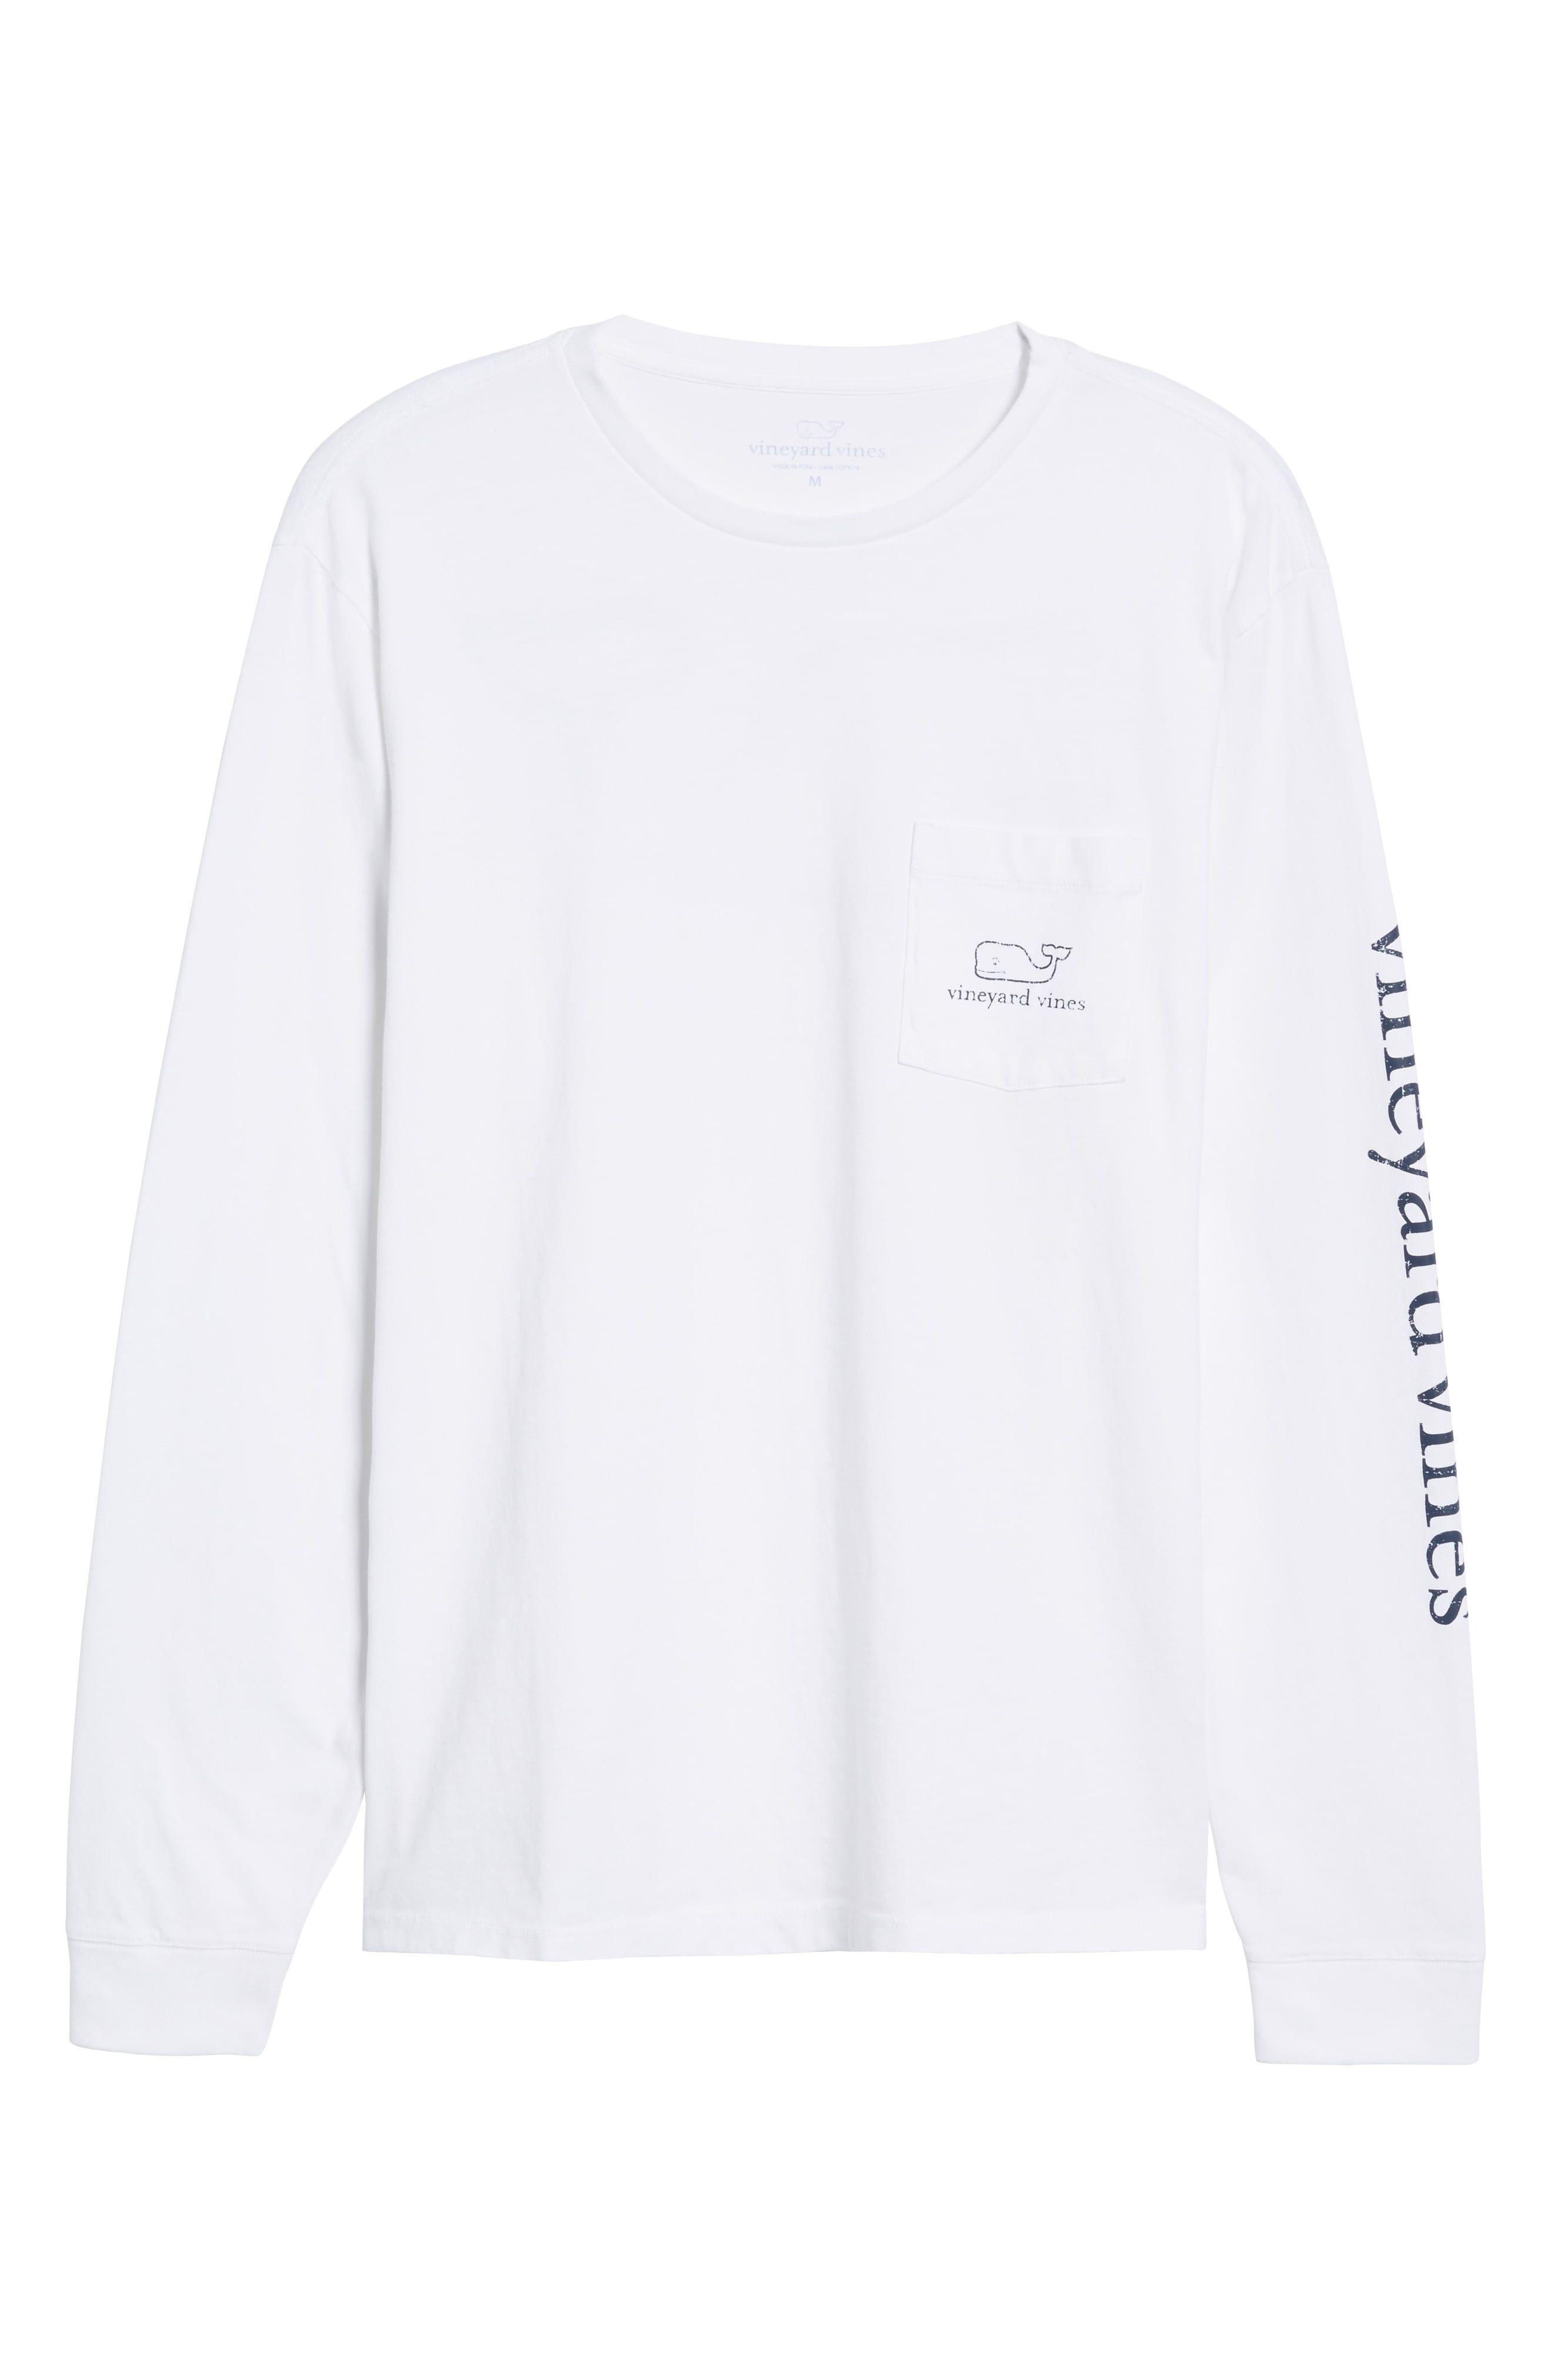 ce3aaa1f57 Men's Big & Tall Vineyard Vines Vintage Long Sleeve Pocket T-Shirt, Size  3XB - White